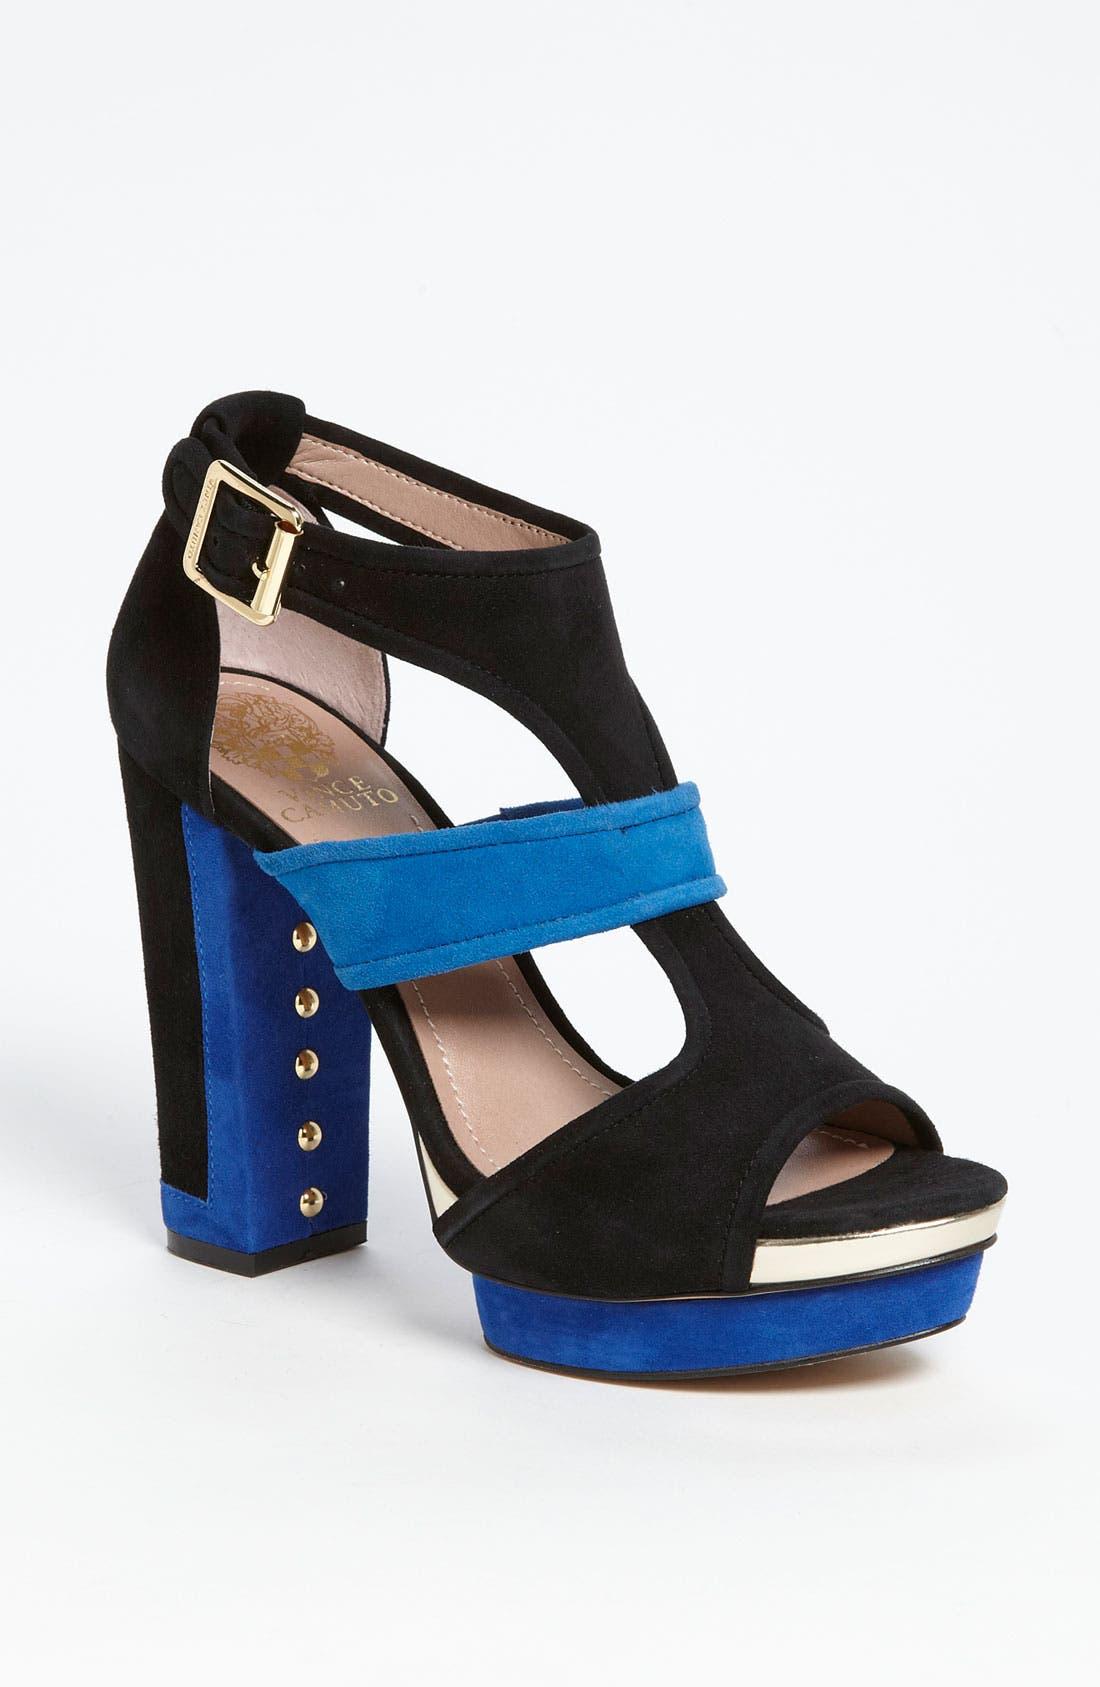 Main Image - Vince Camuto 'Padon' Sandal